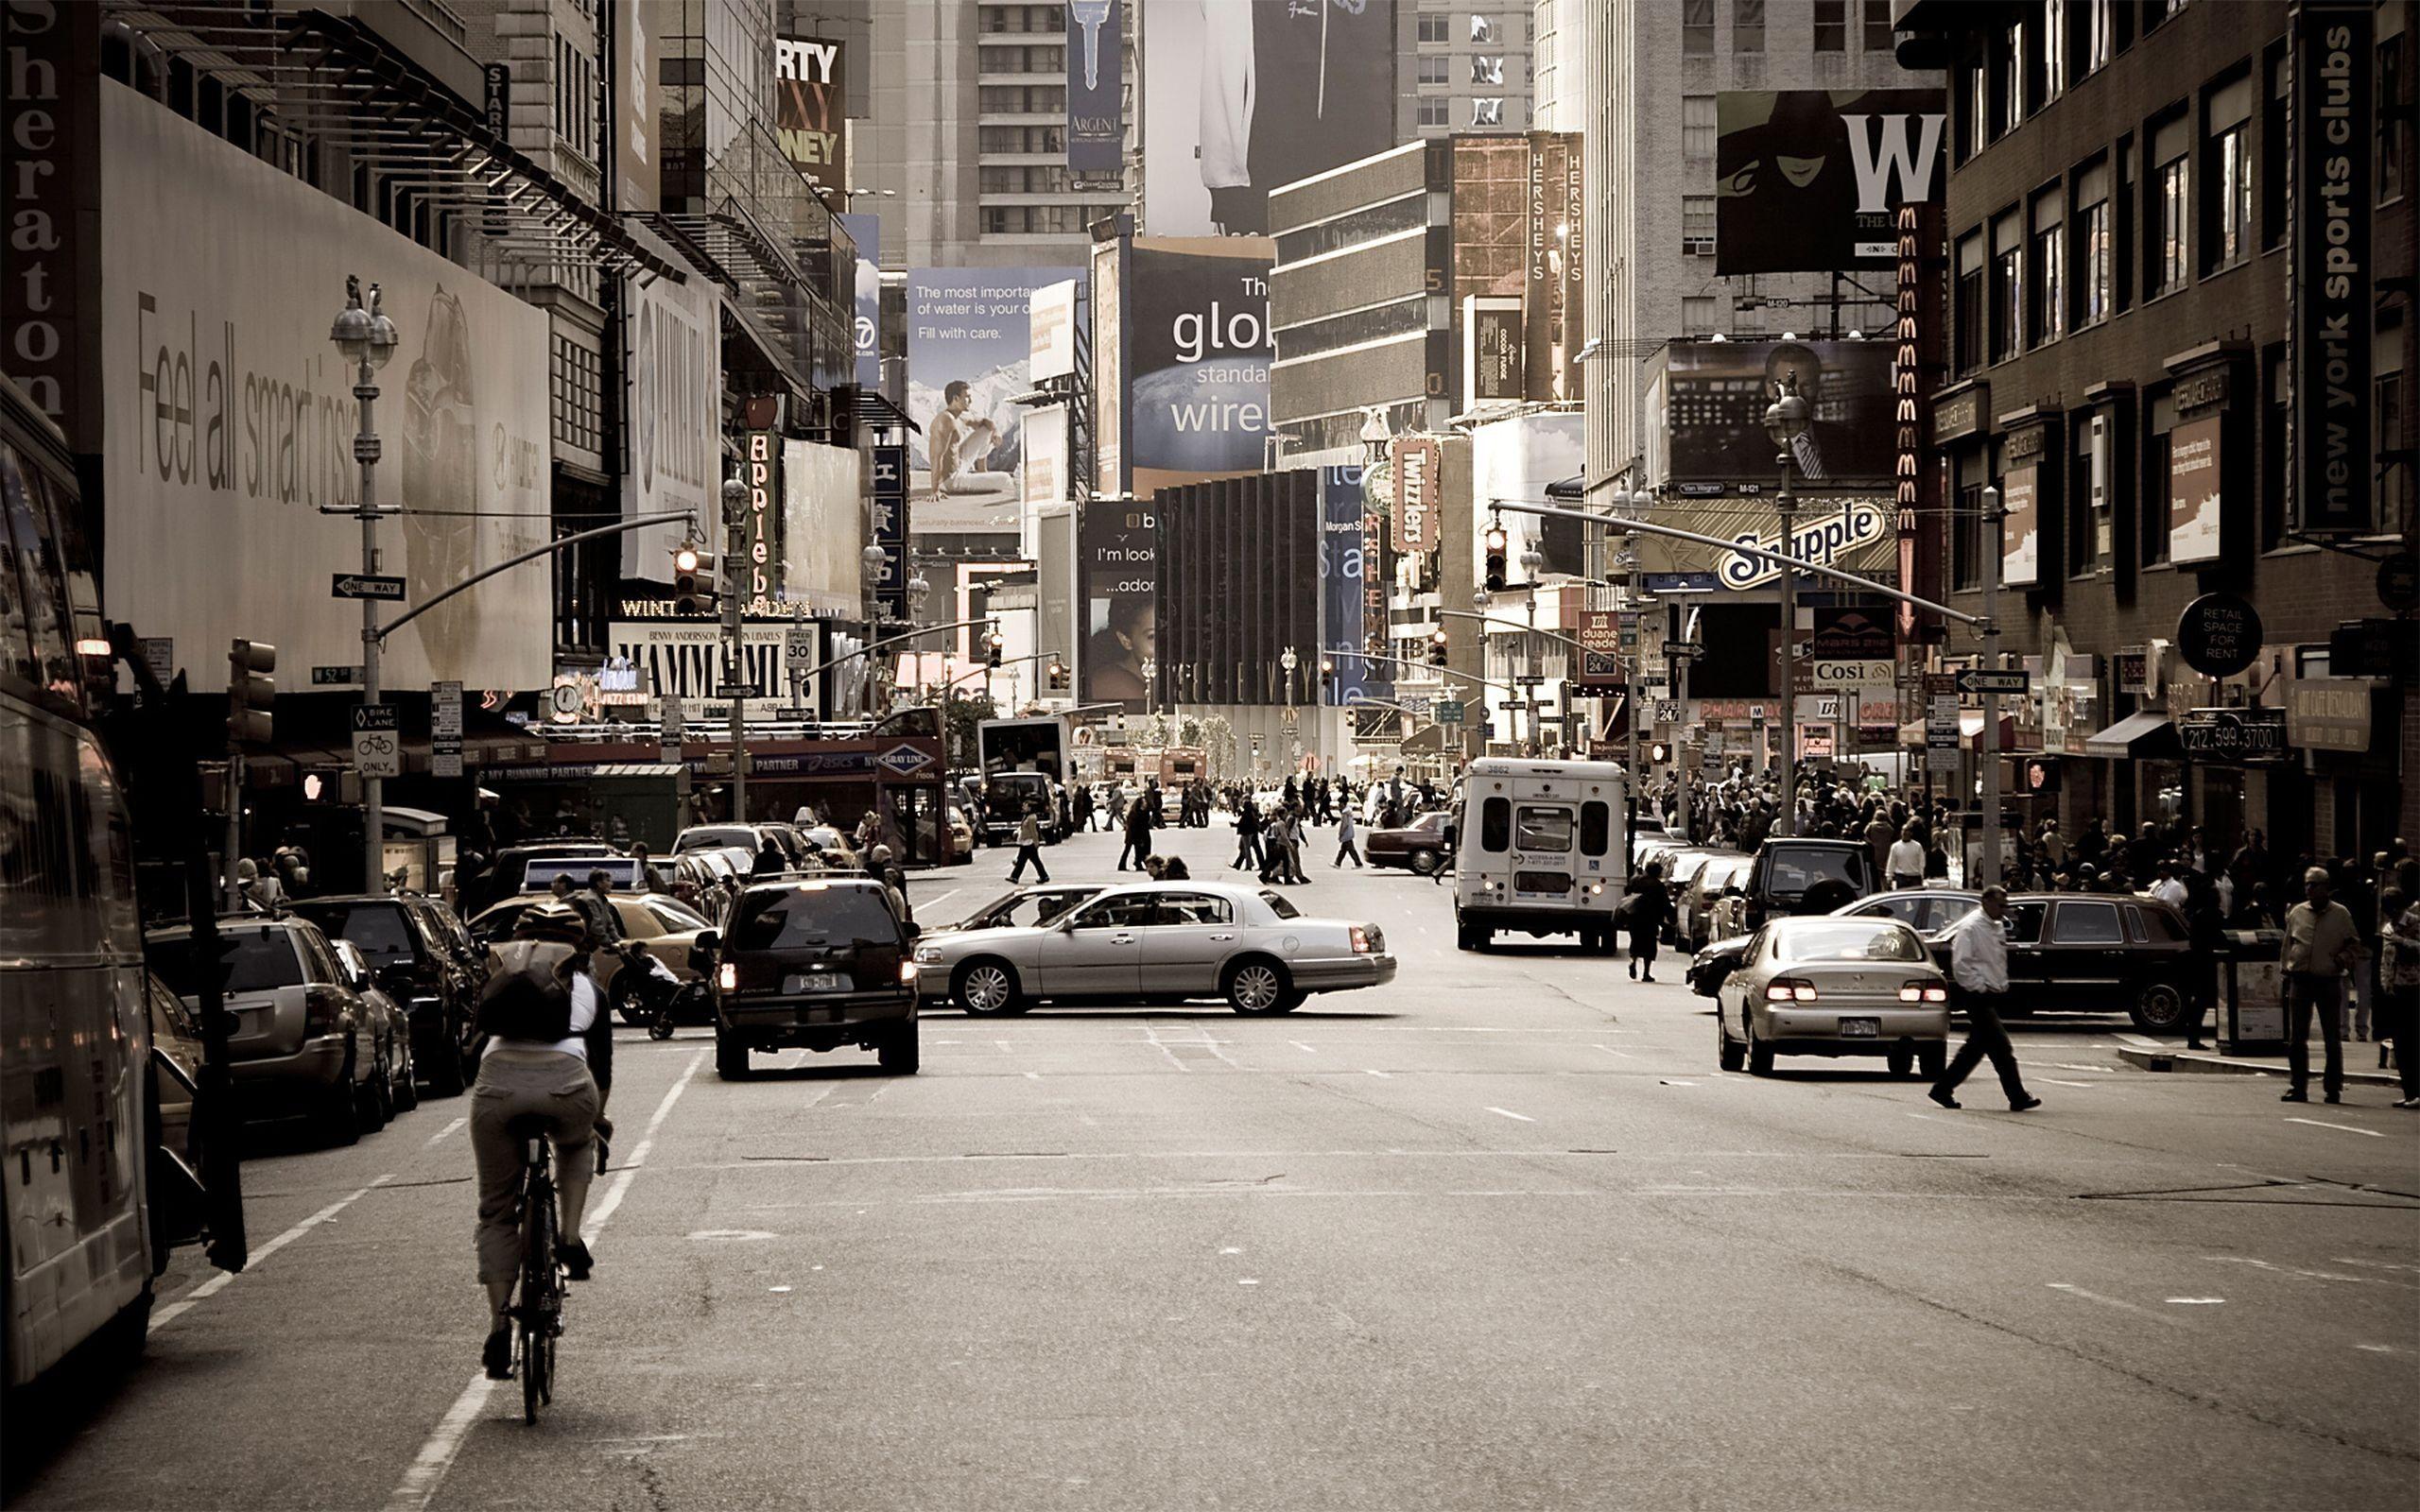 Most Inspiring Wallpaper City Background - 63a7690542b4c5e712fdb214d626df8b  Collection_654662 .jpg